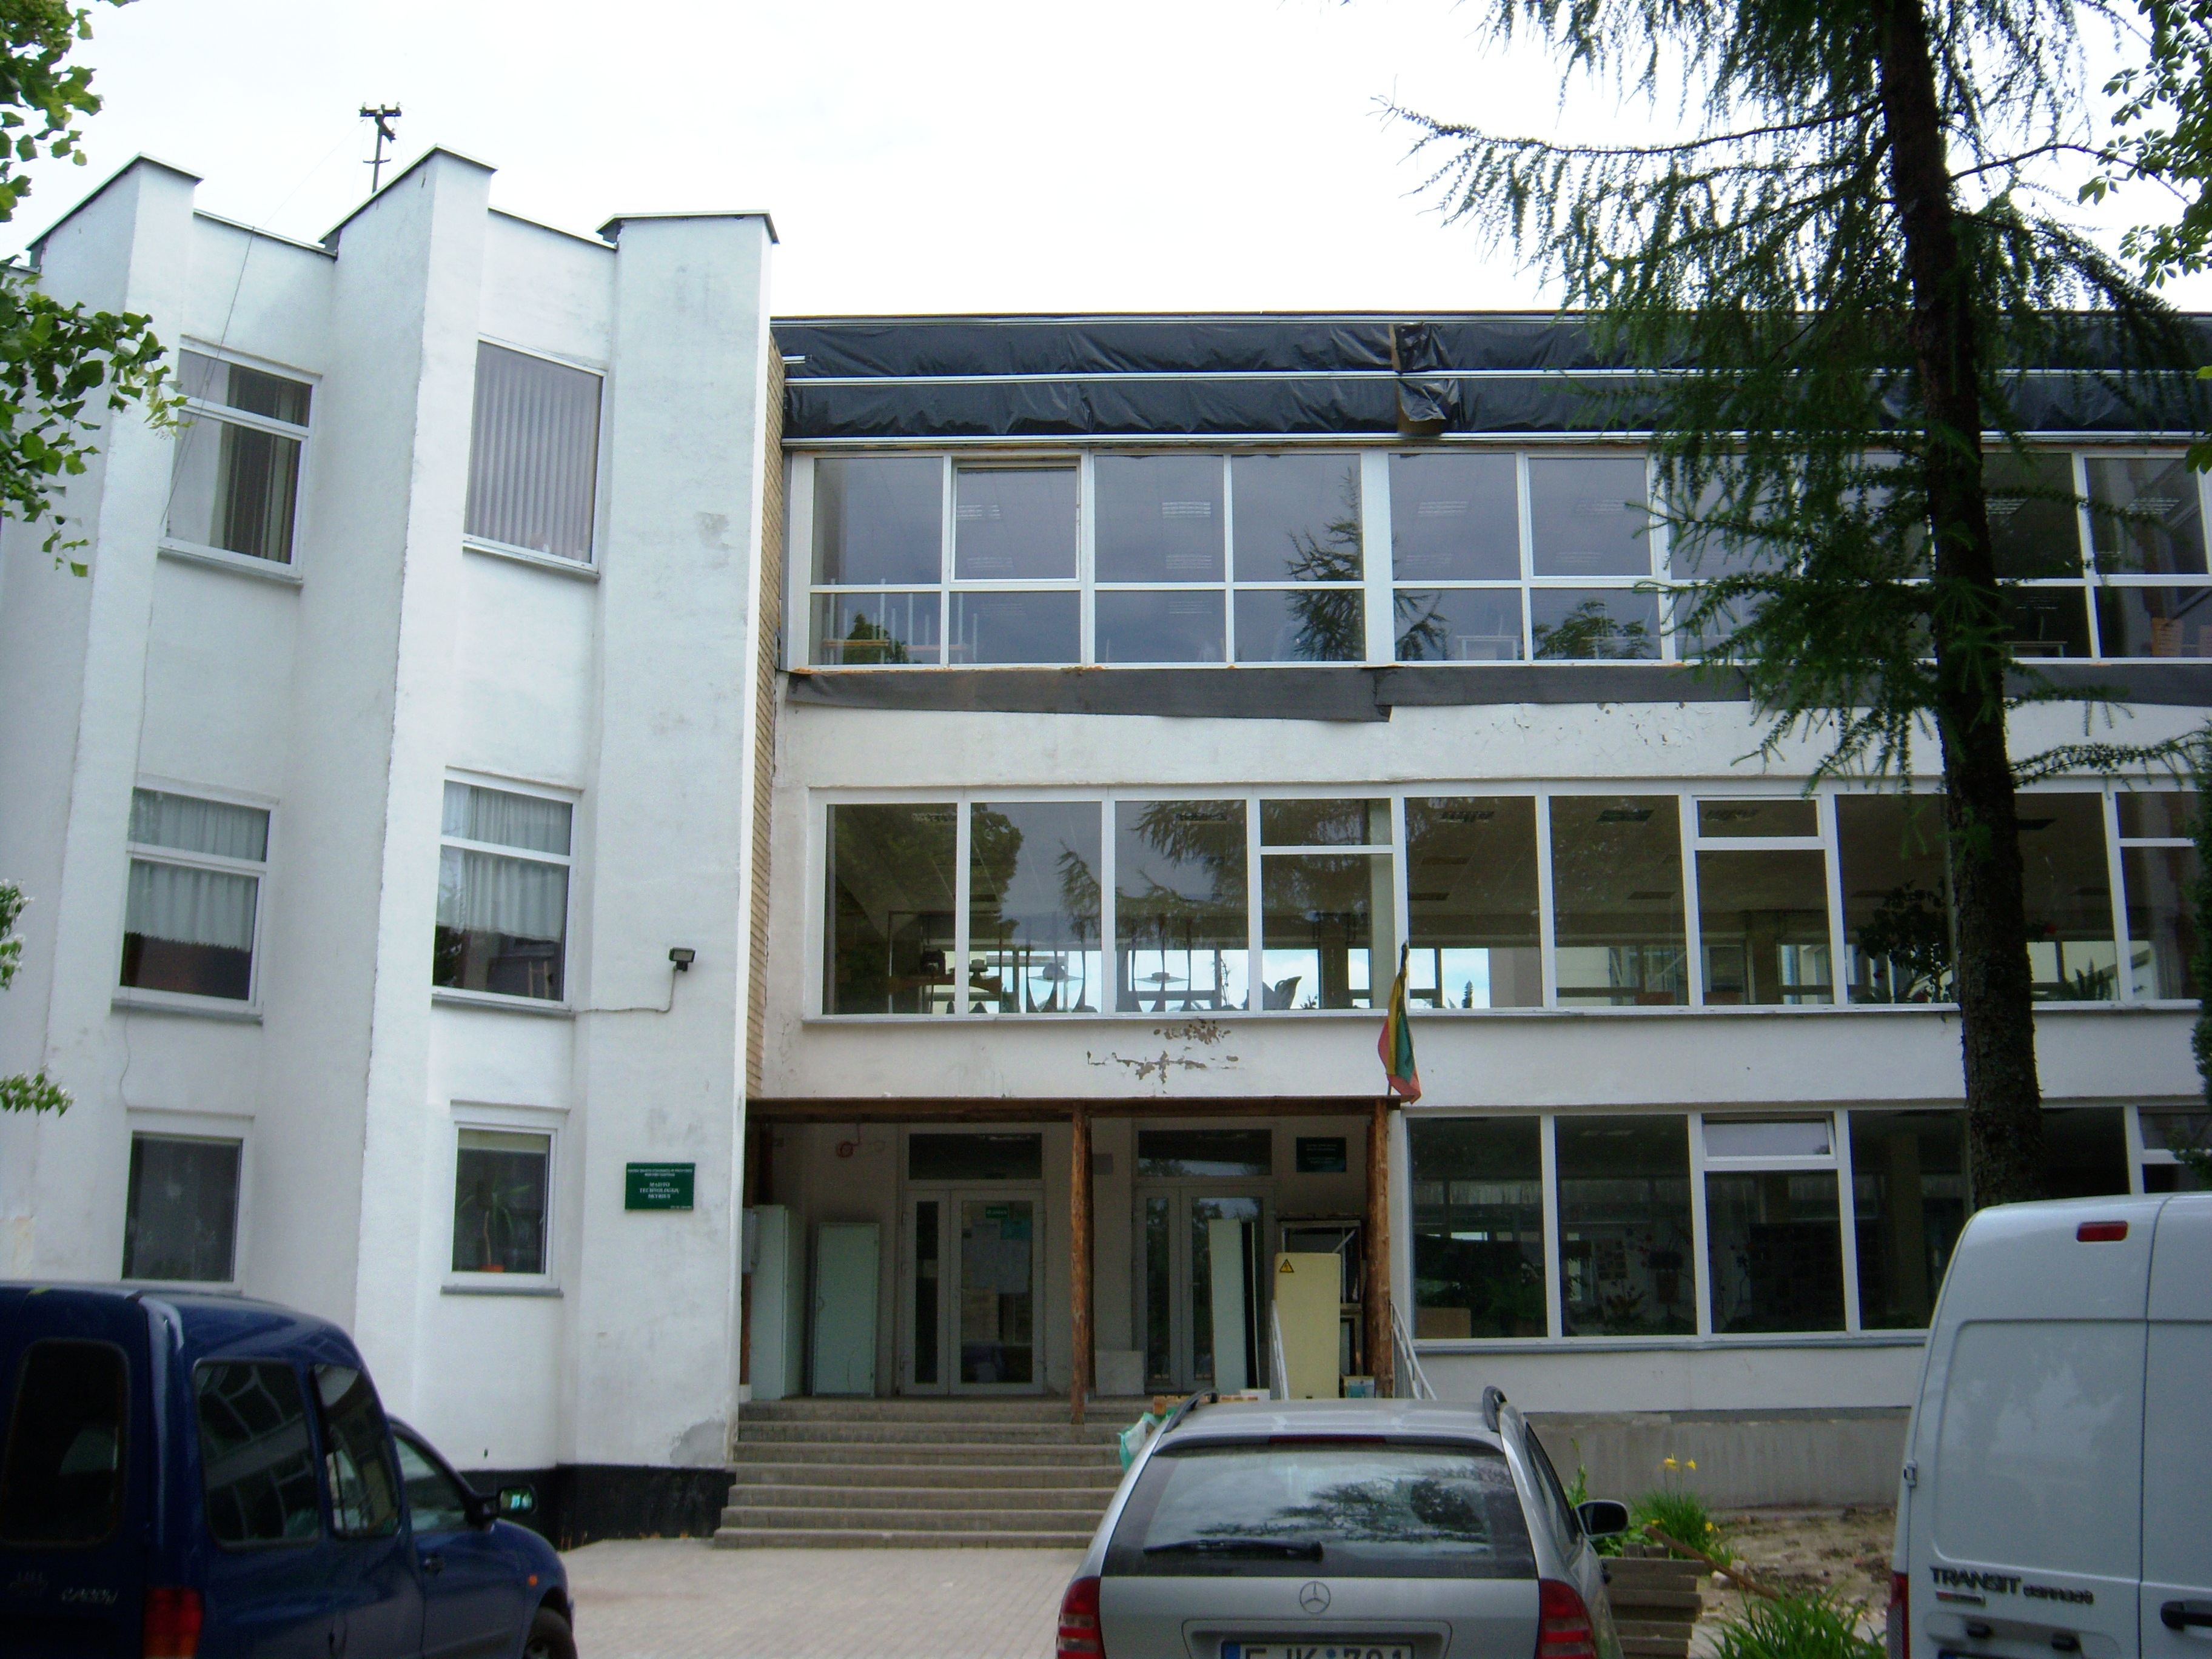 prekybos mokykla